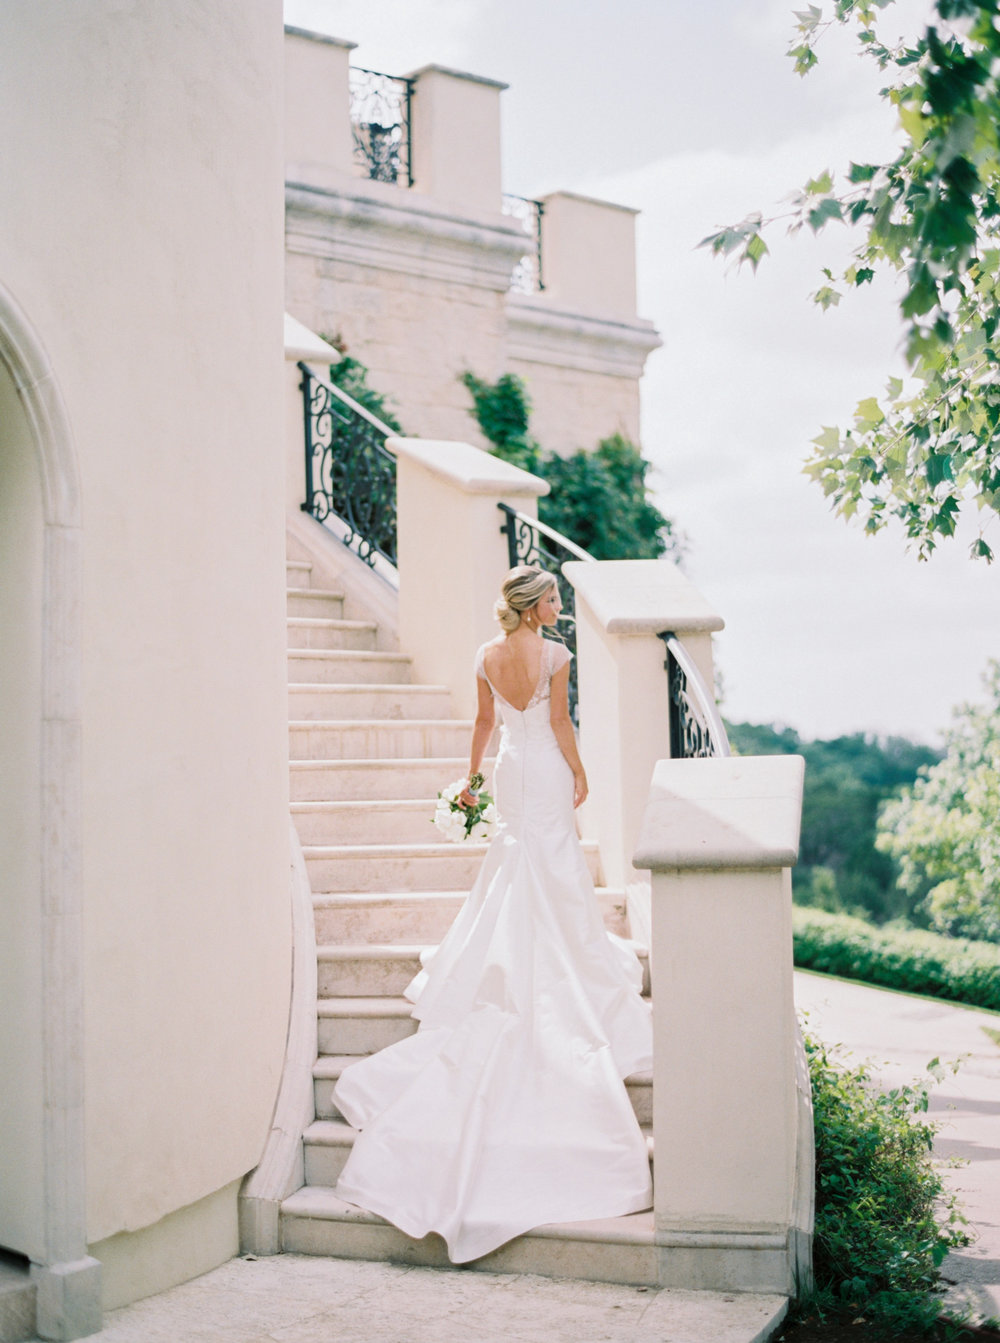 jenna mcelroy weddings